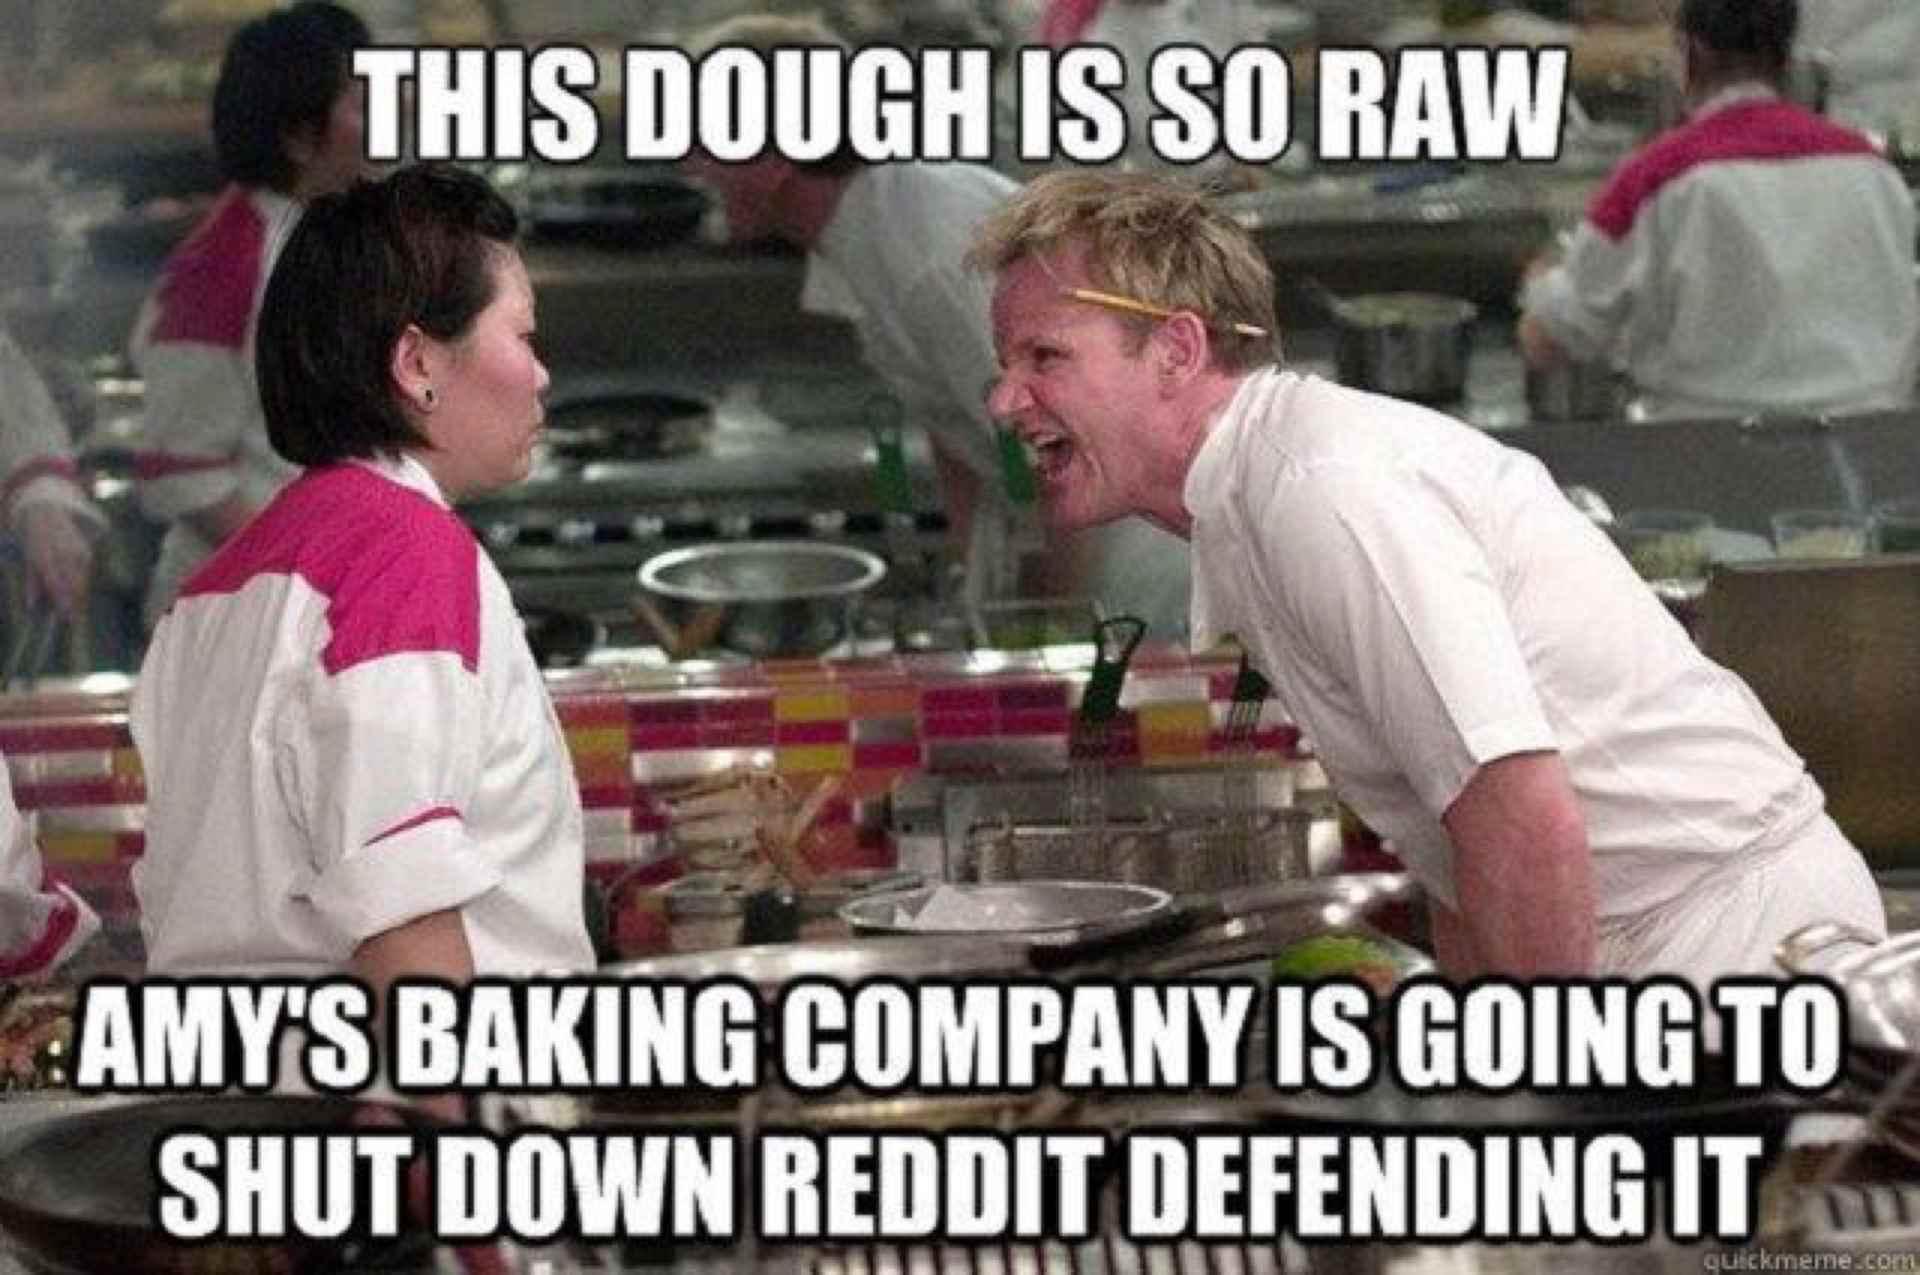 Meme of Gordon Ramsey yelling at a woman.